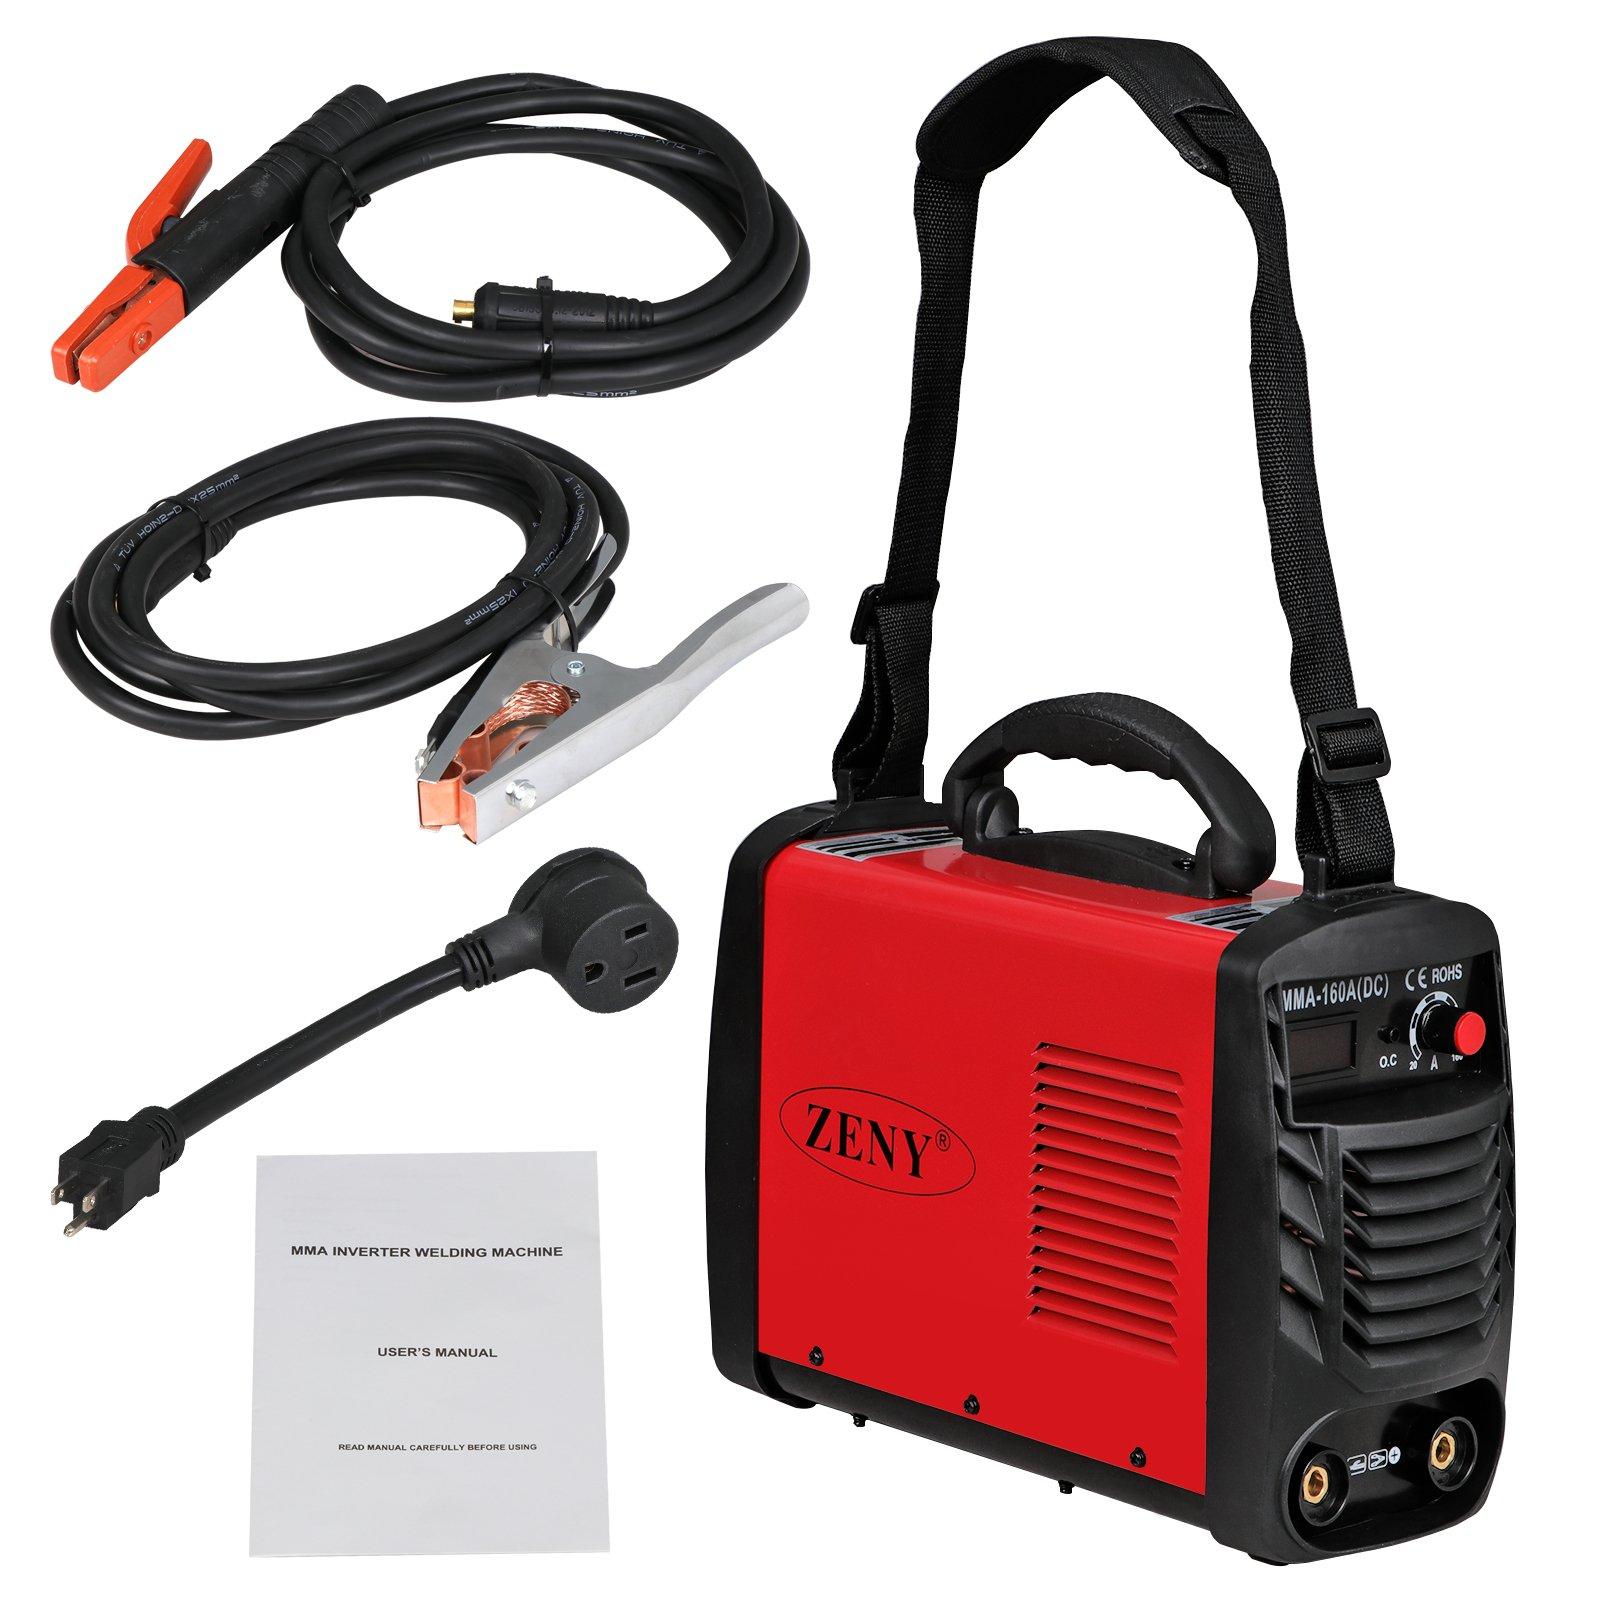 ZENY Arc Welding Machine DC Inverter Handheld Welder MMA 20-160A IGBT 110V/230V Dual Voltage IGBT Stick by ZENY (Image #3)